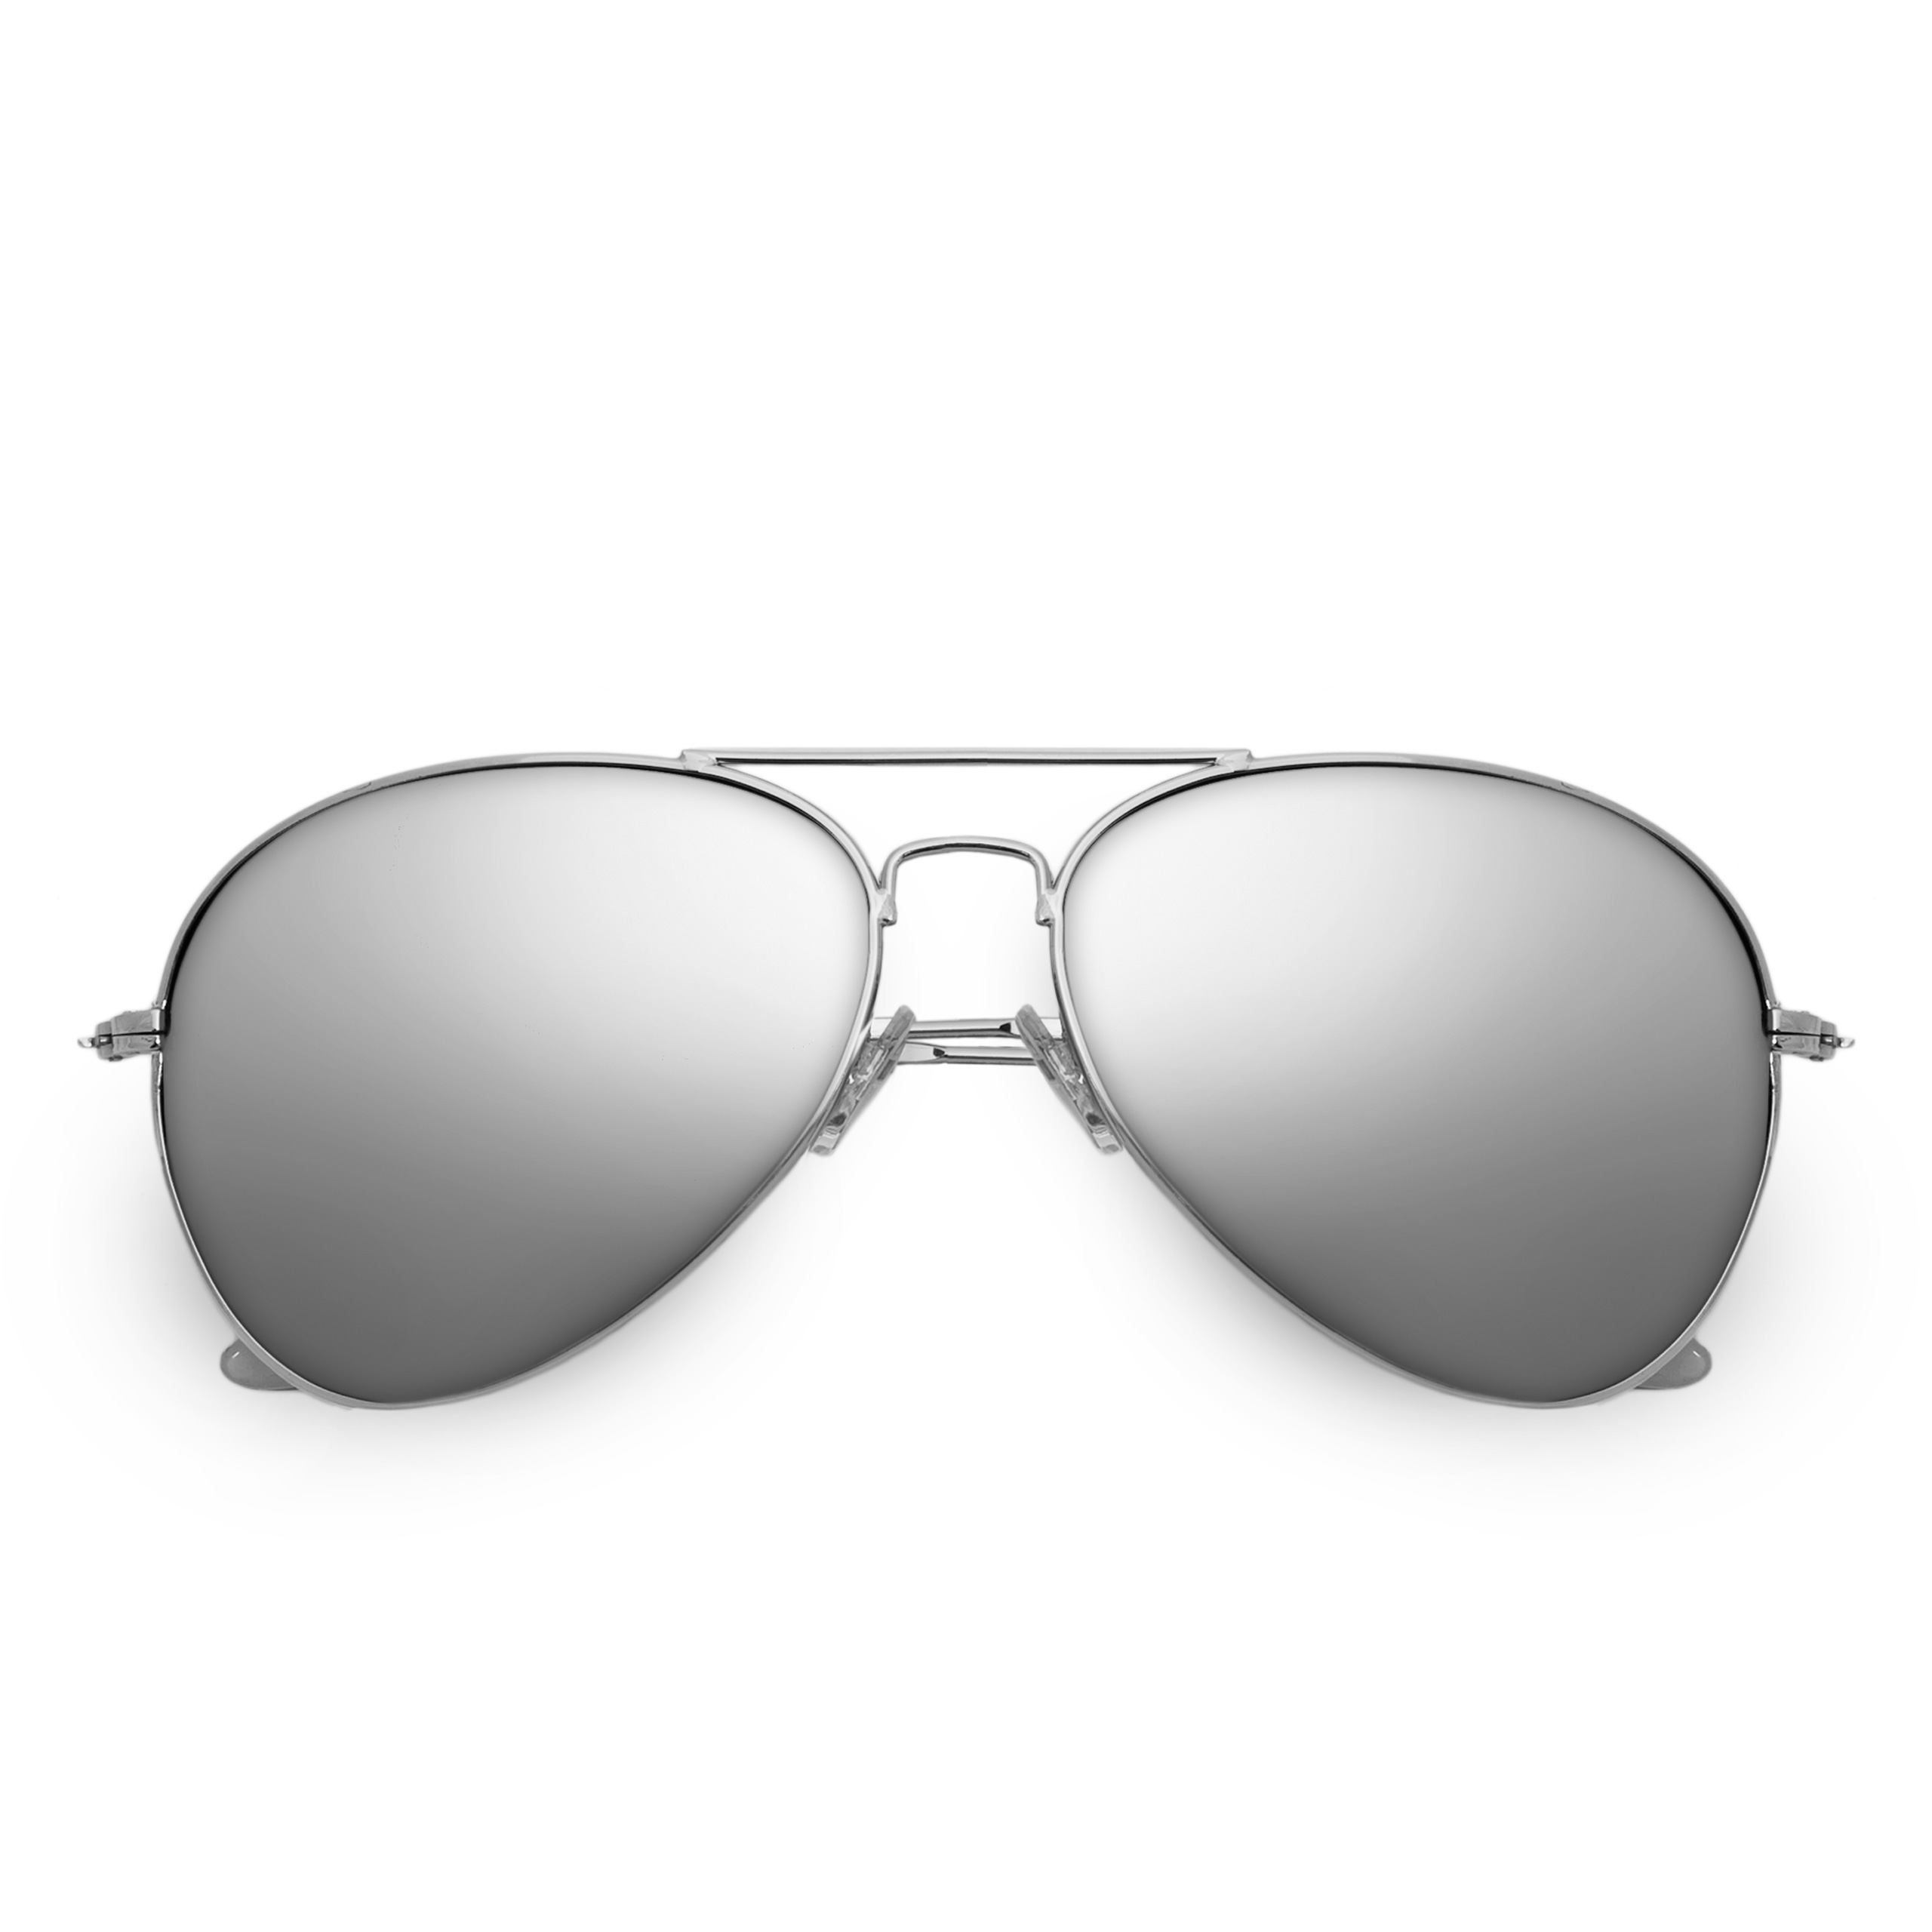 sonnenbrille pilotenbrille lennon aviator brille rund. Black Bedroom Furniture Sets. Home Design Ideas